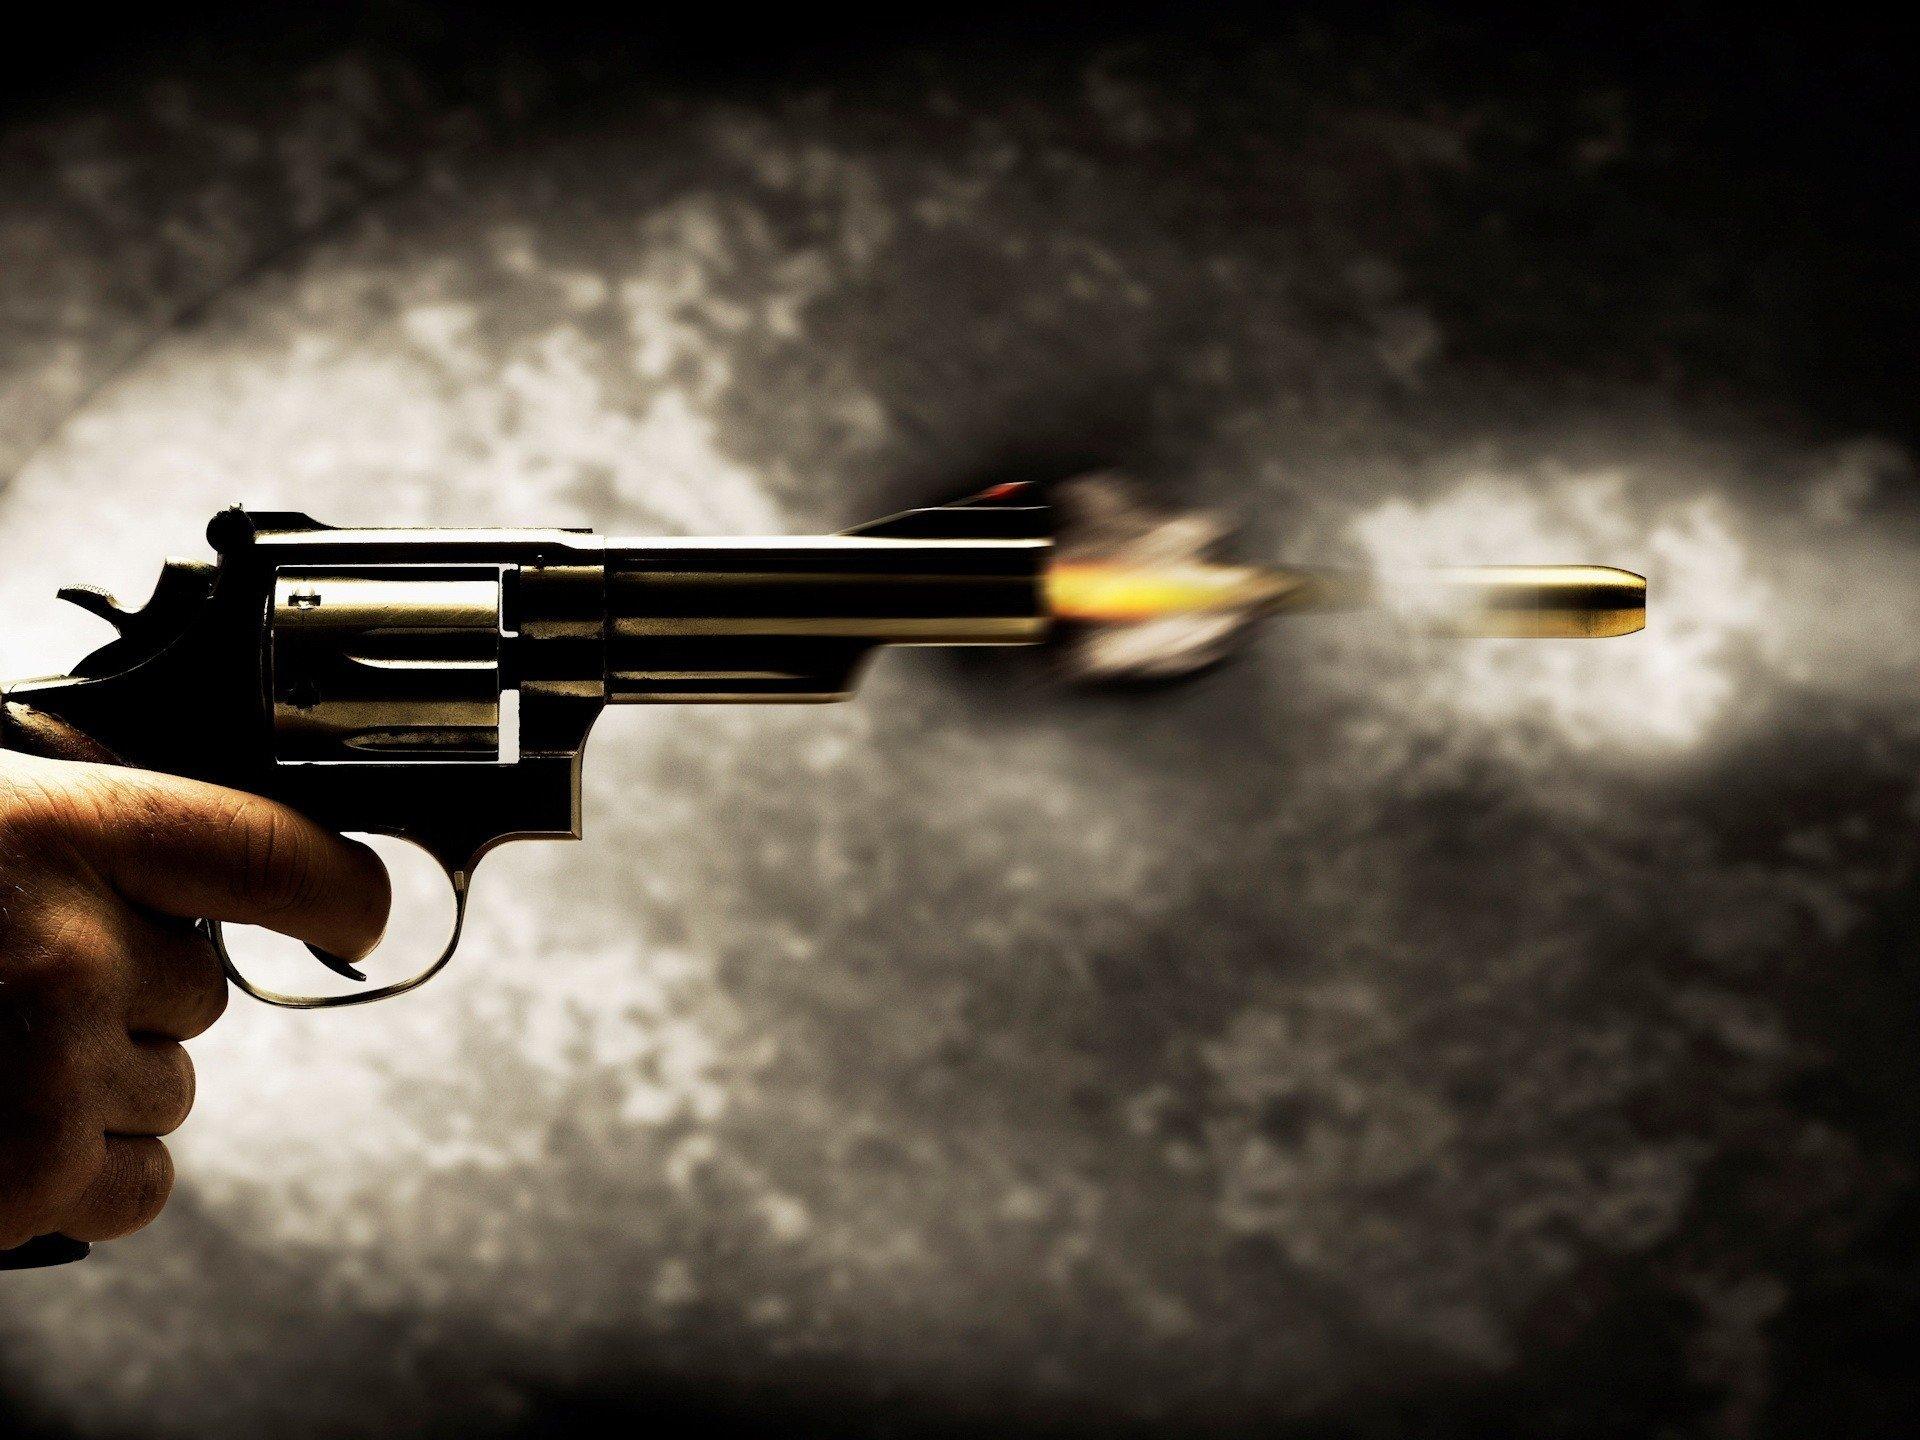 Weapons - Revolver  Wallpaper